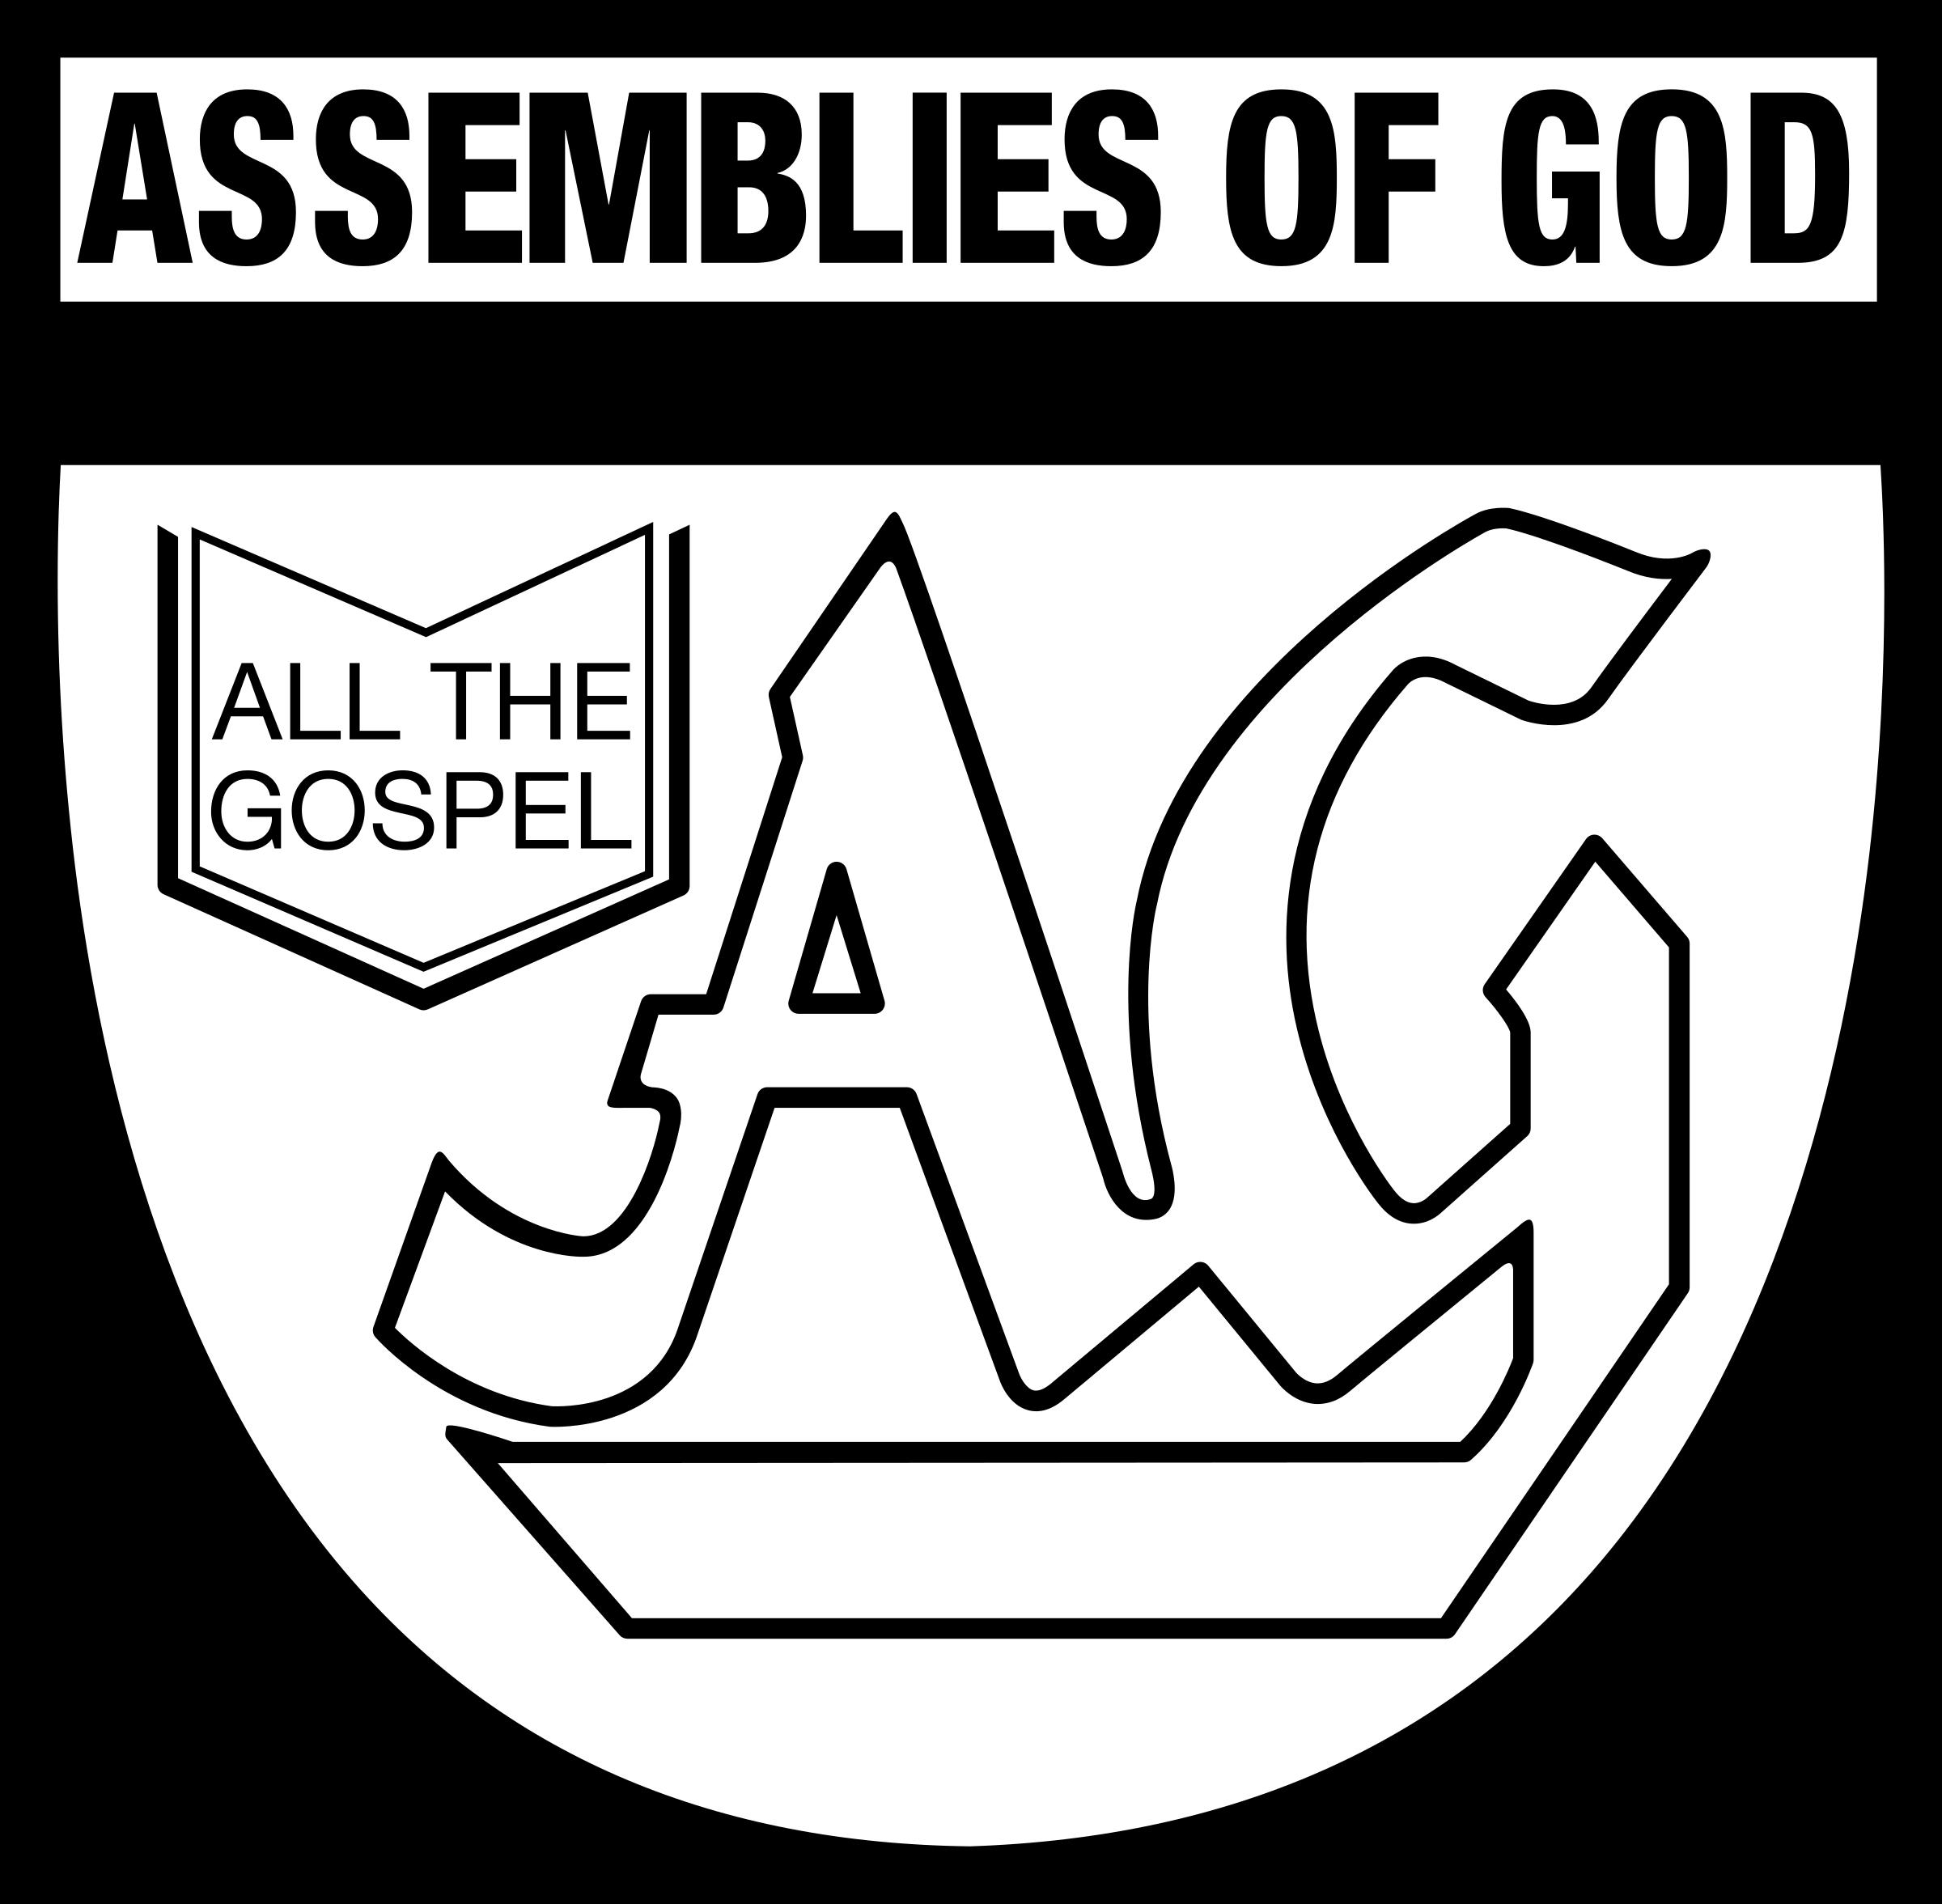 assemblies of god Logo PNG Transparent & SVG Vector.